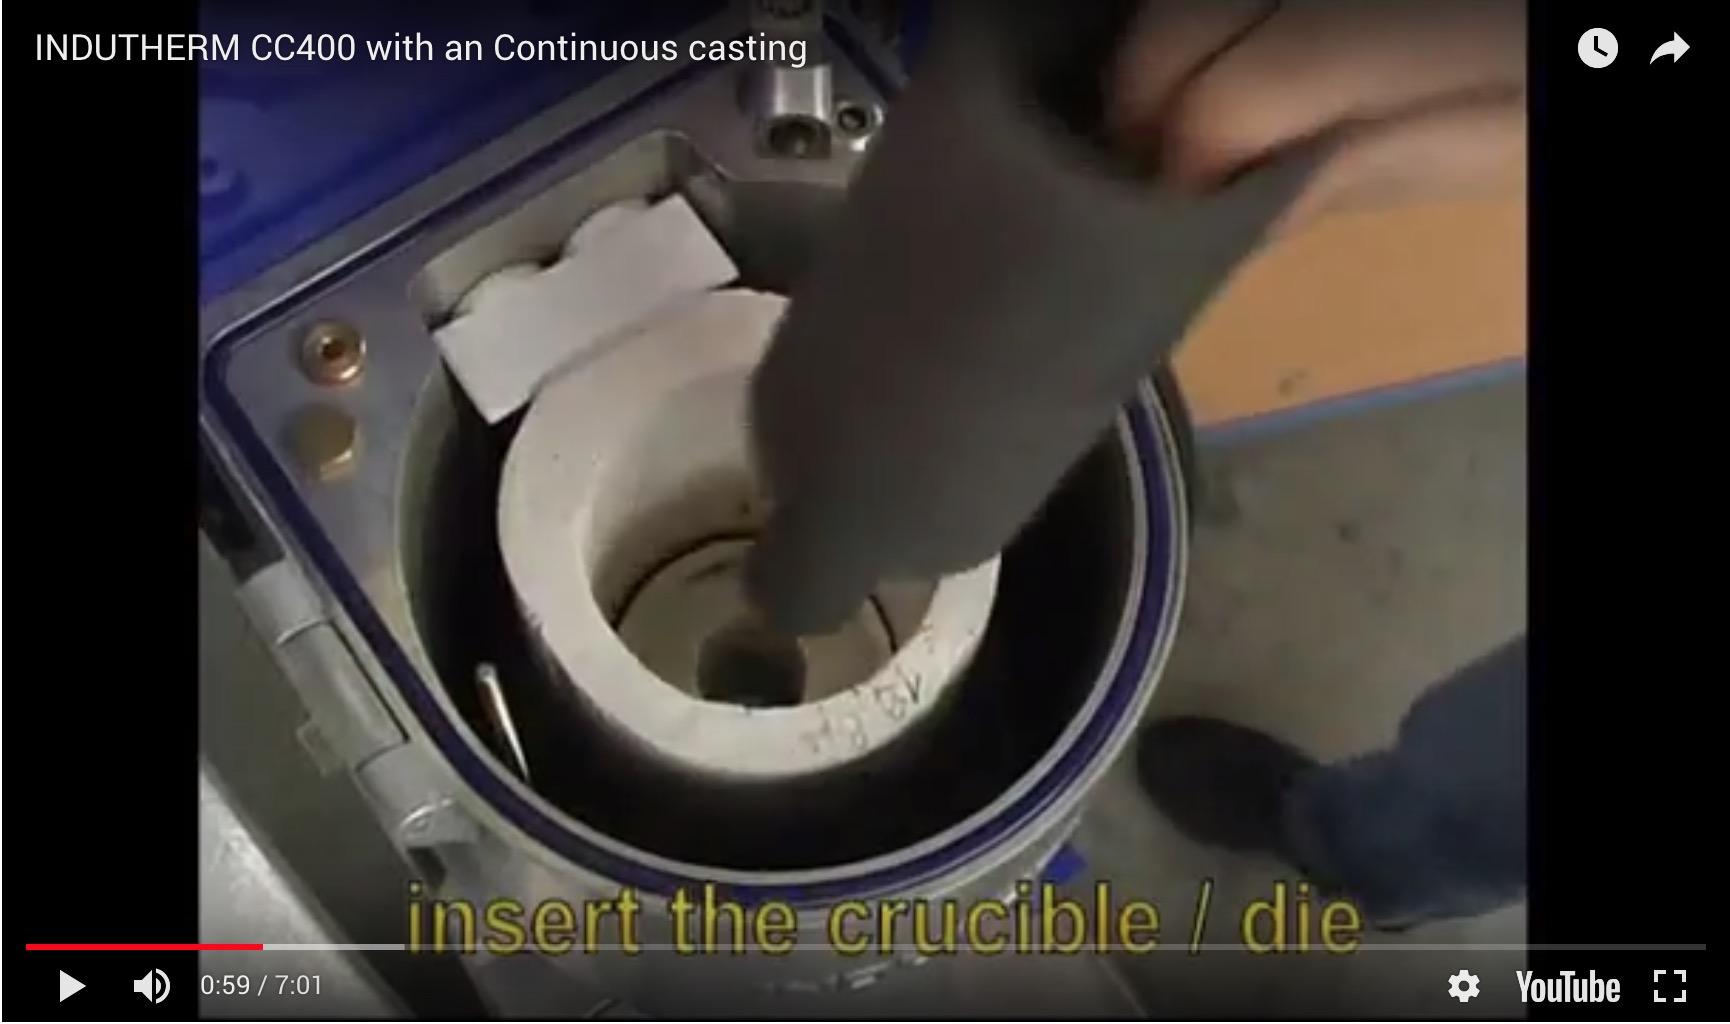 Indutherm CC400 Continuous Casting Machine